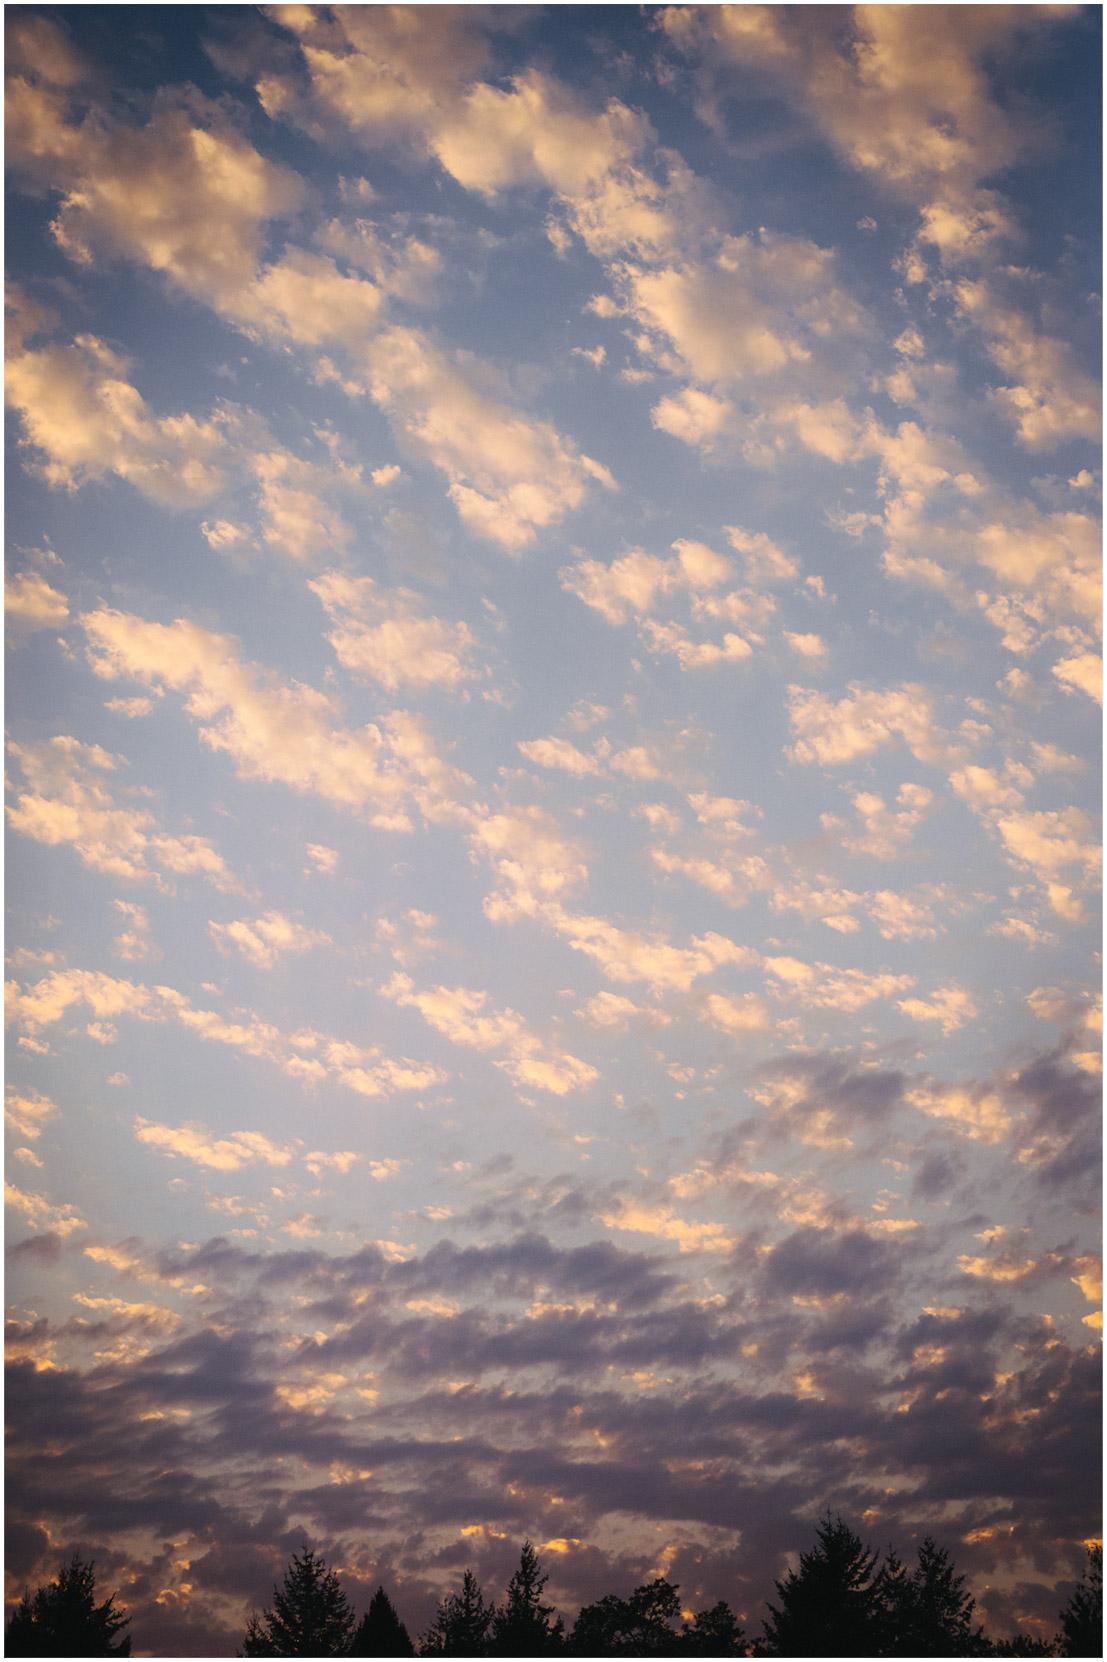 Corbin-at-the-CSA-Farm-September-21-2014-Clouds